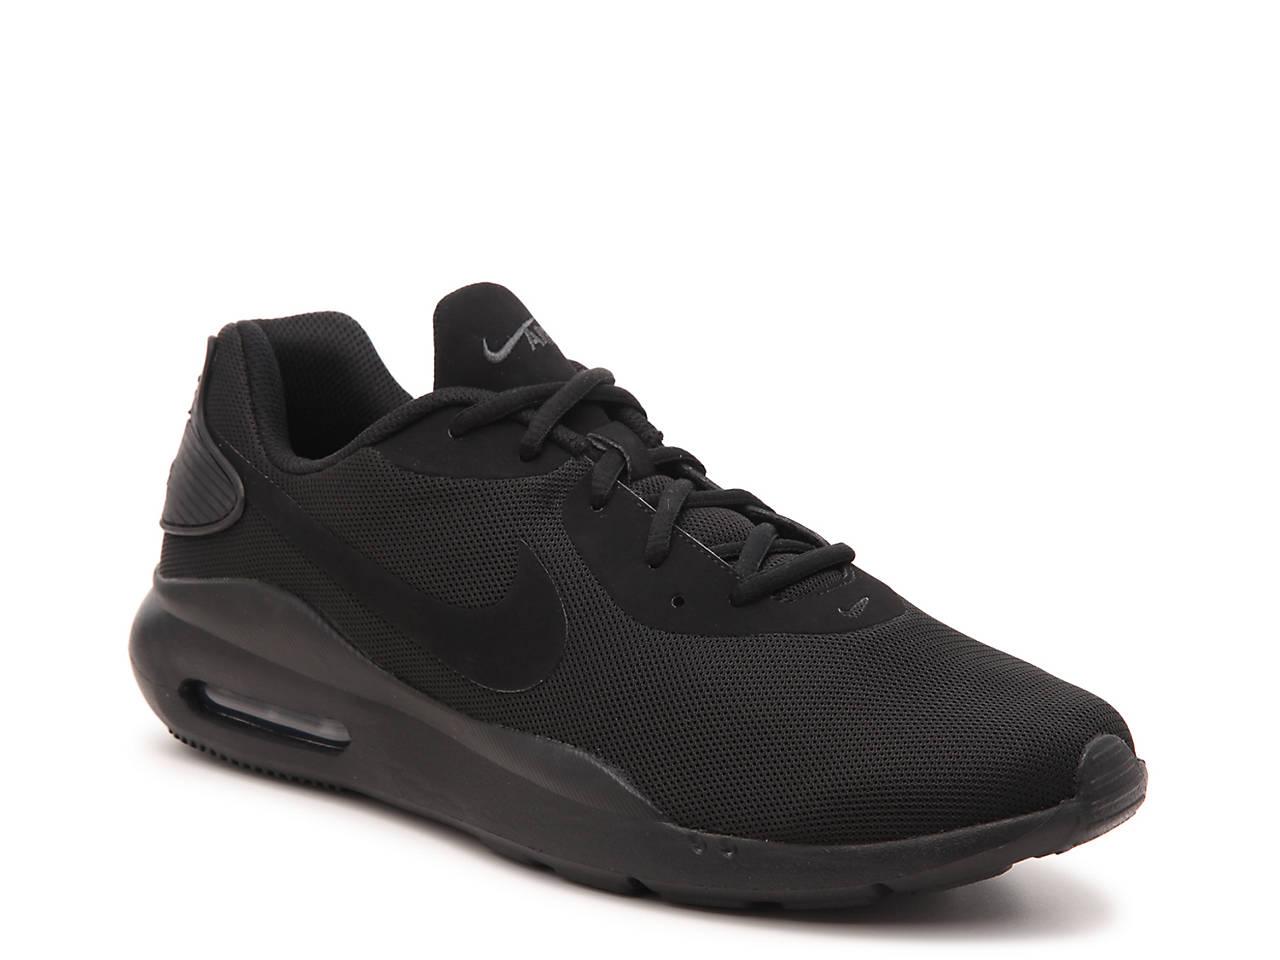 095acdd468e78 Nike Air Max Oketo Sneaker - Men's Men's Shoes | DSW